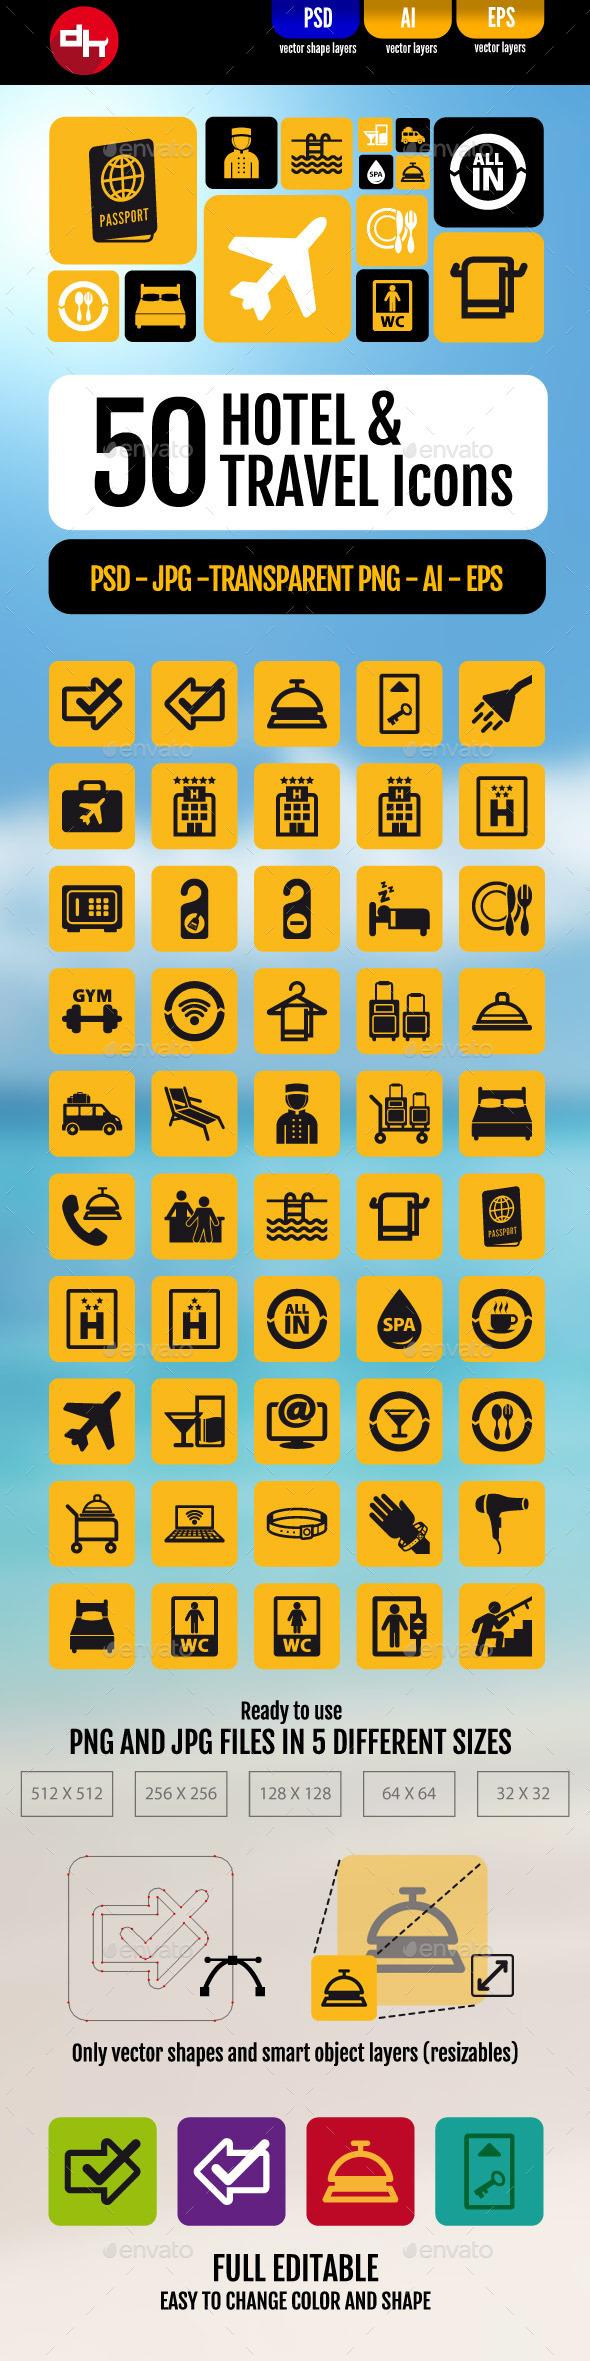 Hotel & Travel Icons Pack - Seasonal Icons